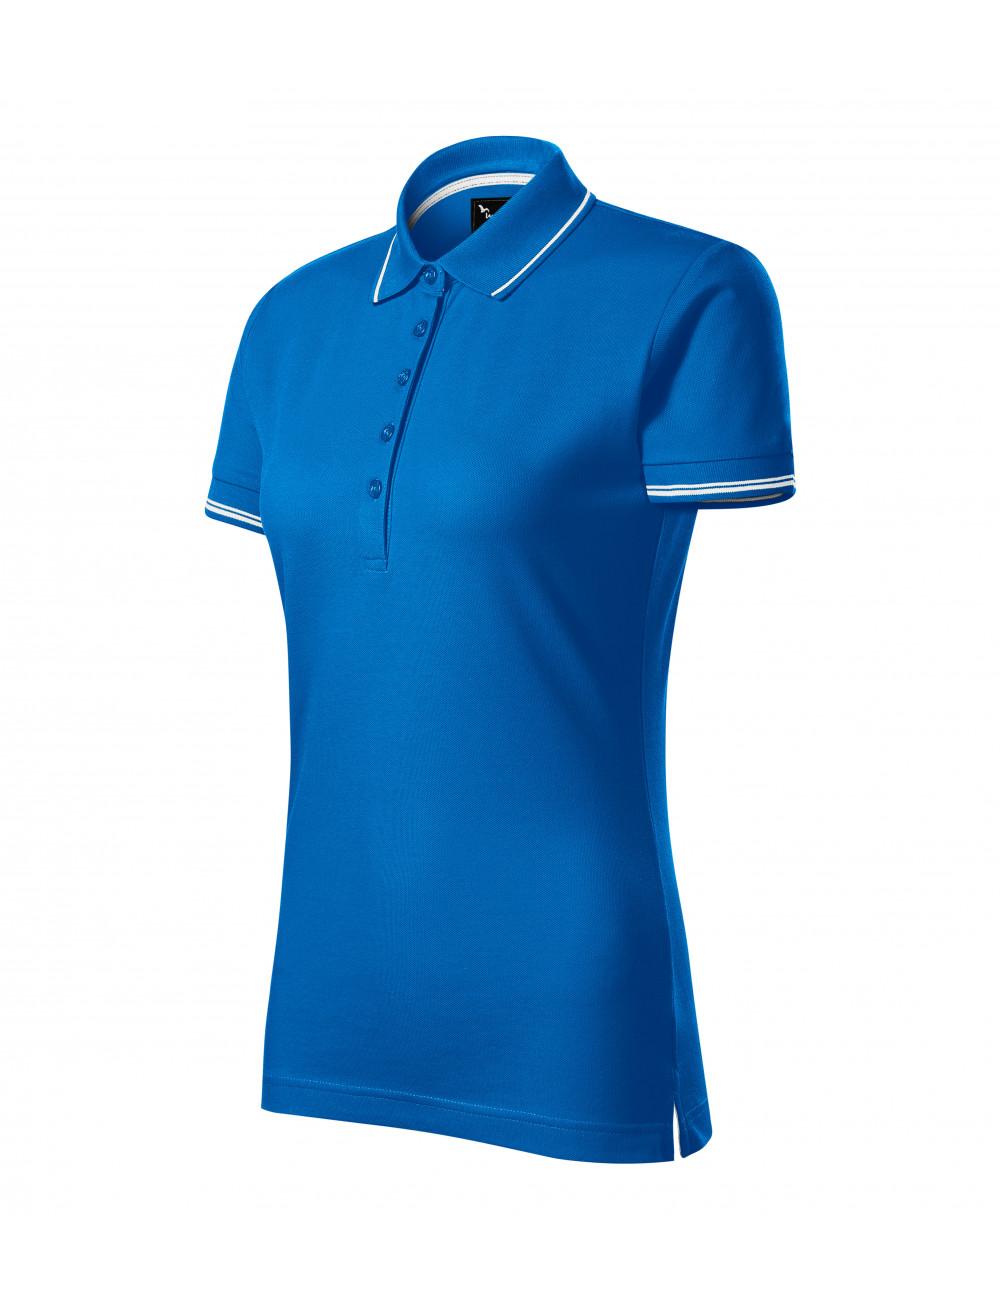 Adler MALFINIPREMIUM Koszulka polo damska Perfection plain 253 snorkel blue